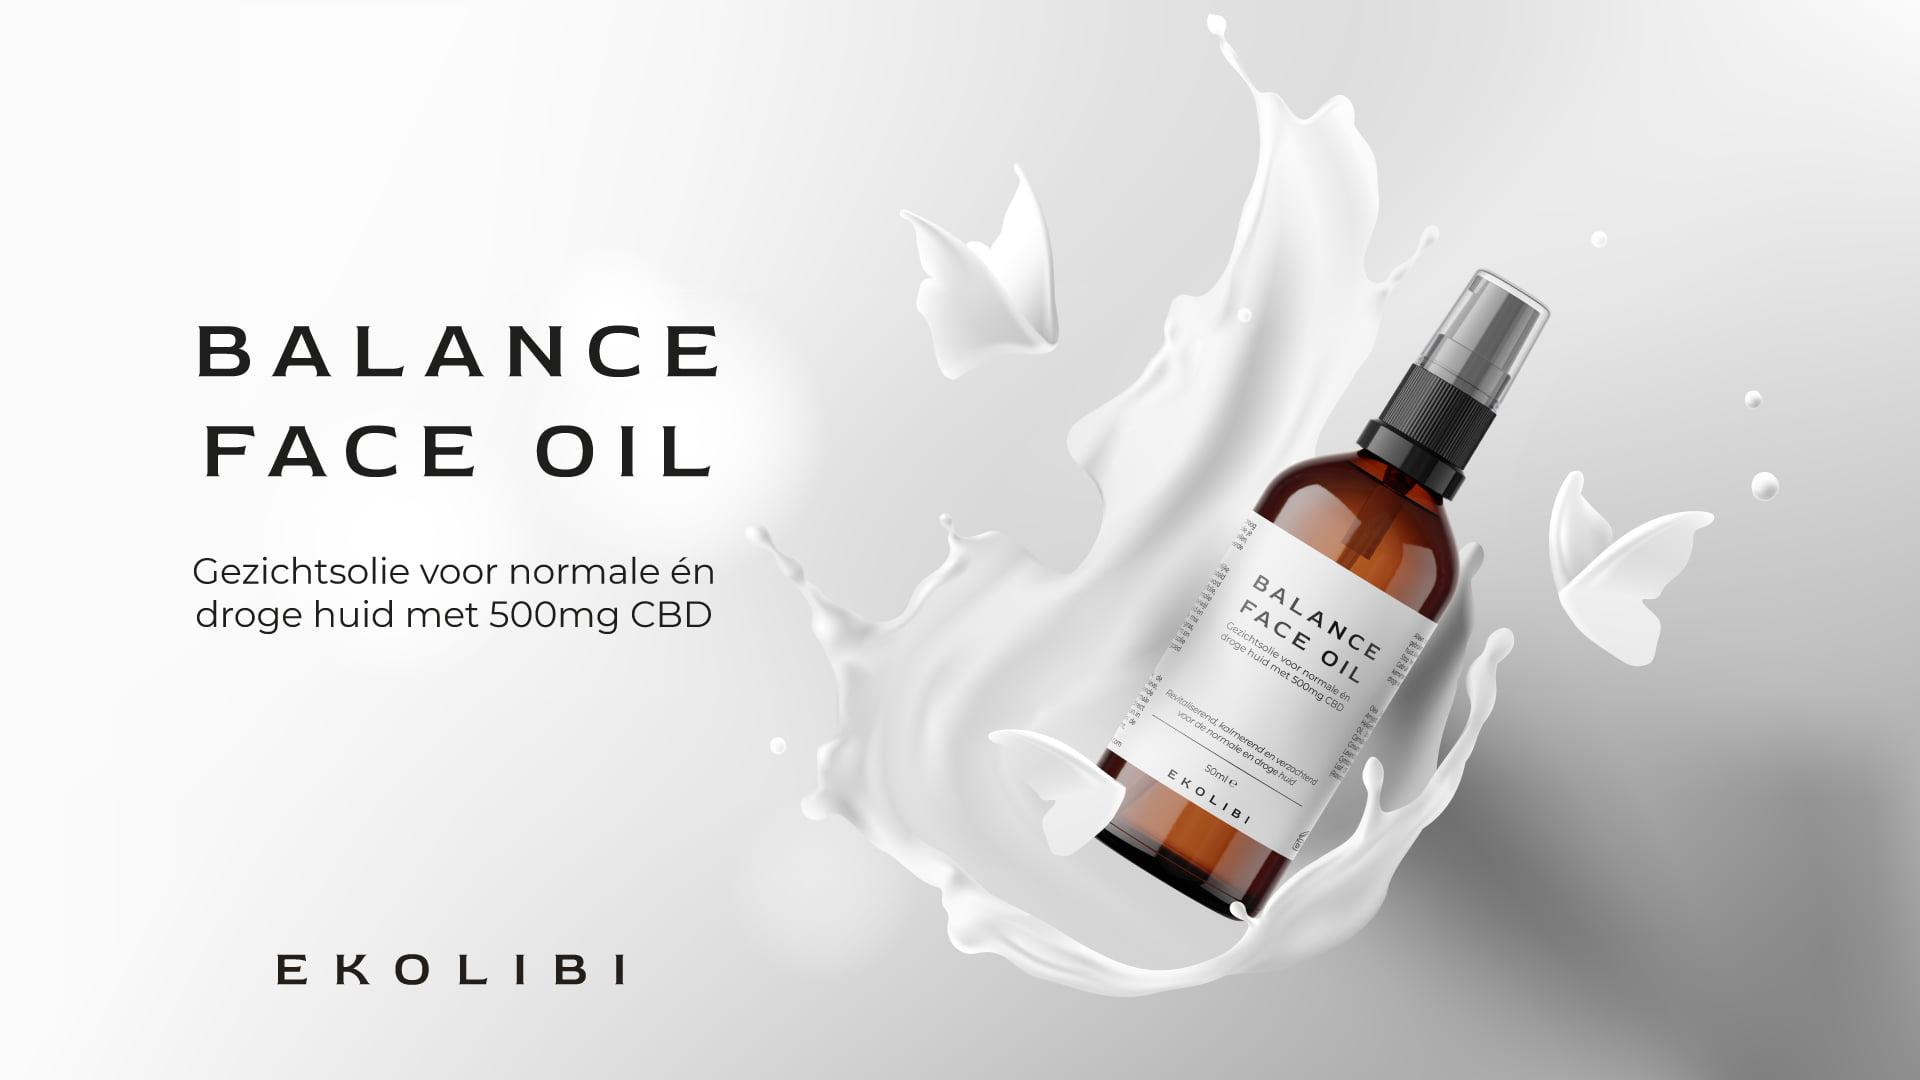 Ekolibi Balance Face Oil CBD productpagina